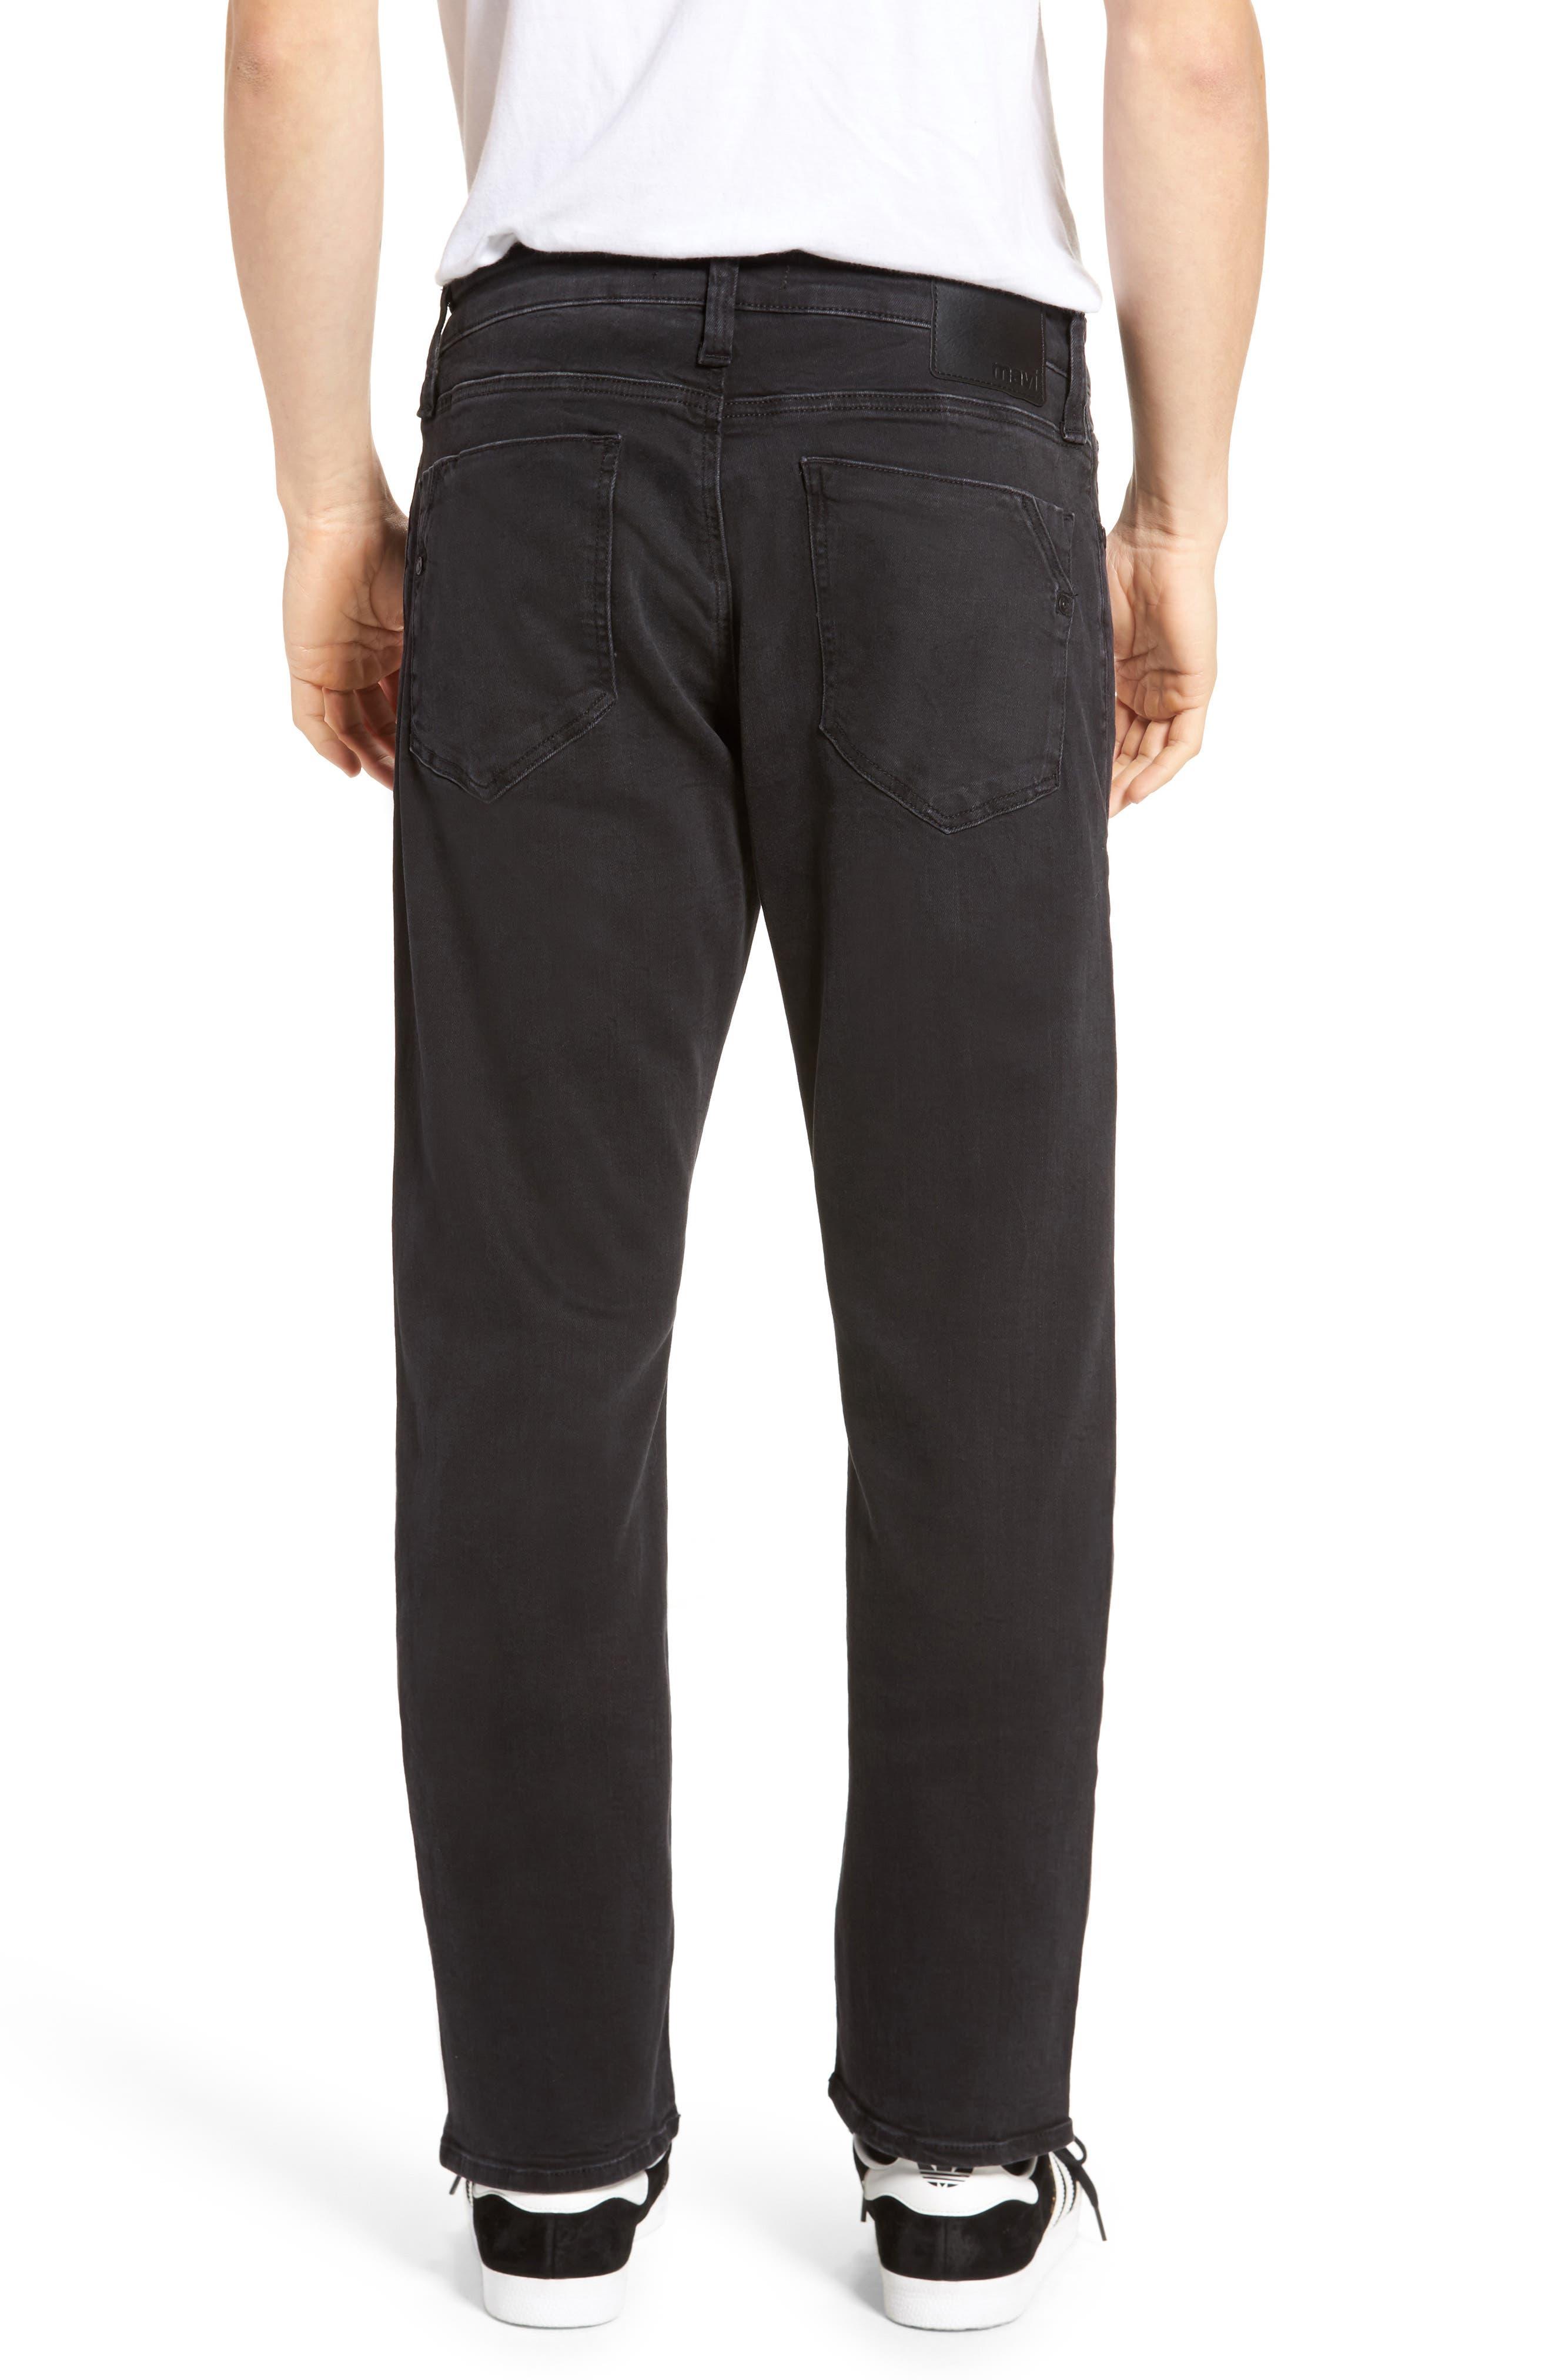 Zach Straight Fit Jeans,                             Alternate thumbnail 2, color,                             050